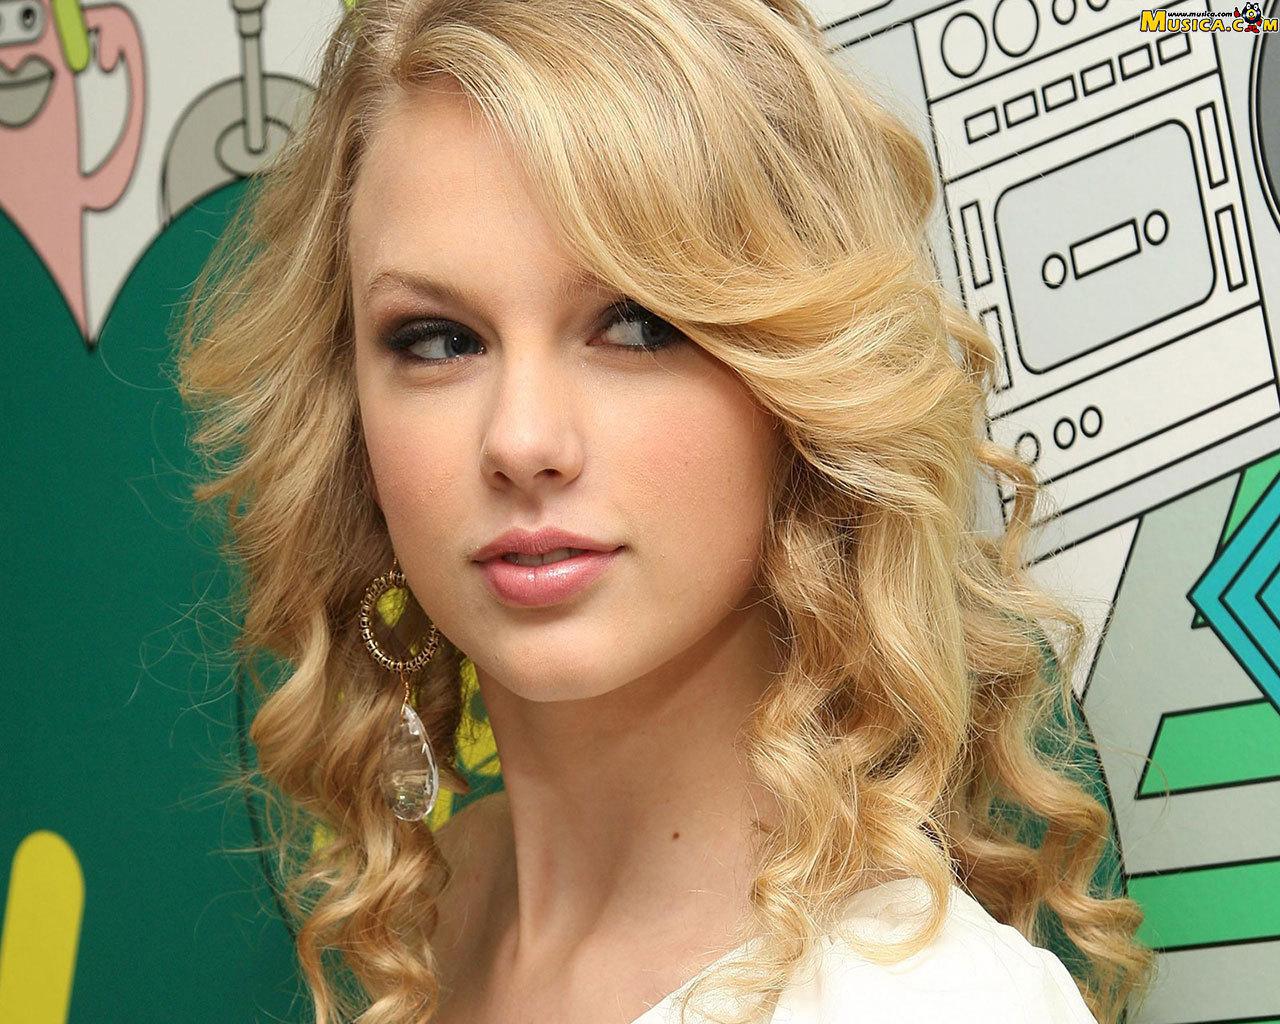 http://4.bp.blogspot.com/-FC1YkJNHW1A/T8U5ECiavUI/AAAAAAAA108/kImCcejDekg/s1600/Taylor_Swift_Popular_Quotes.jpg